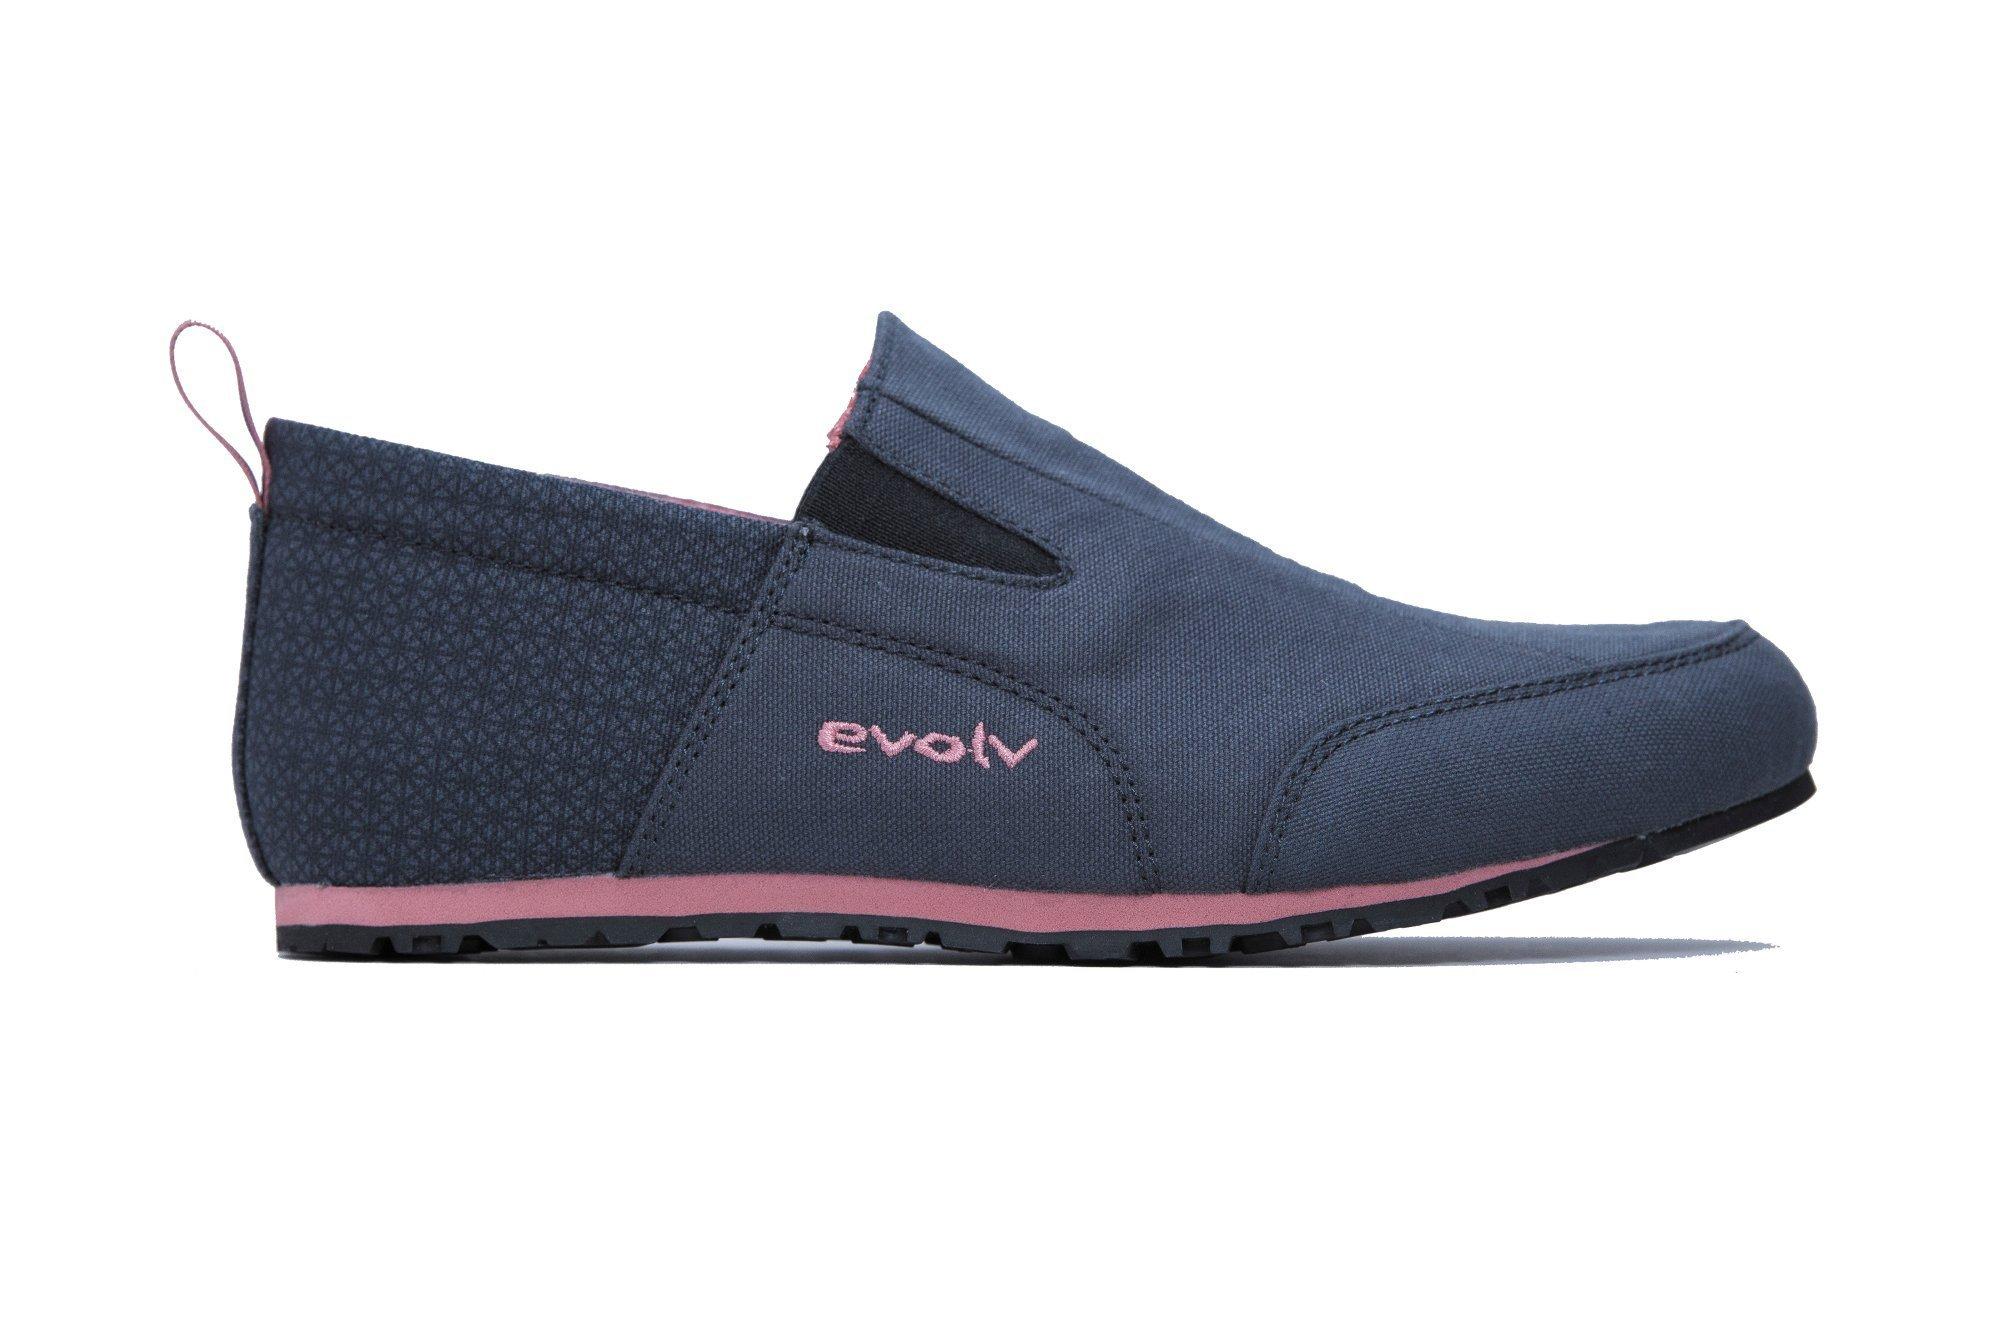 Evolv Cruzer Slip-on Approach Shoe - Women's Phantom/Canyon Rose 6